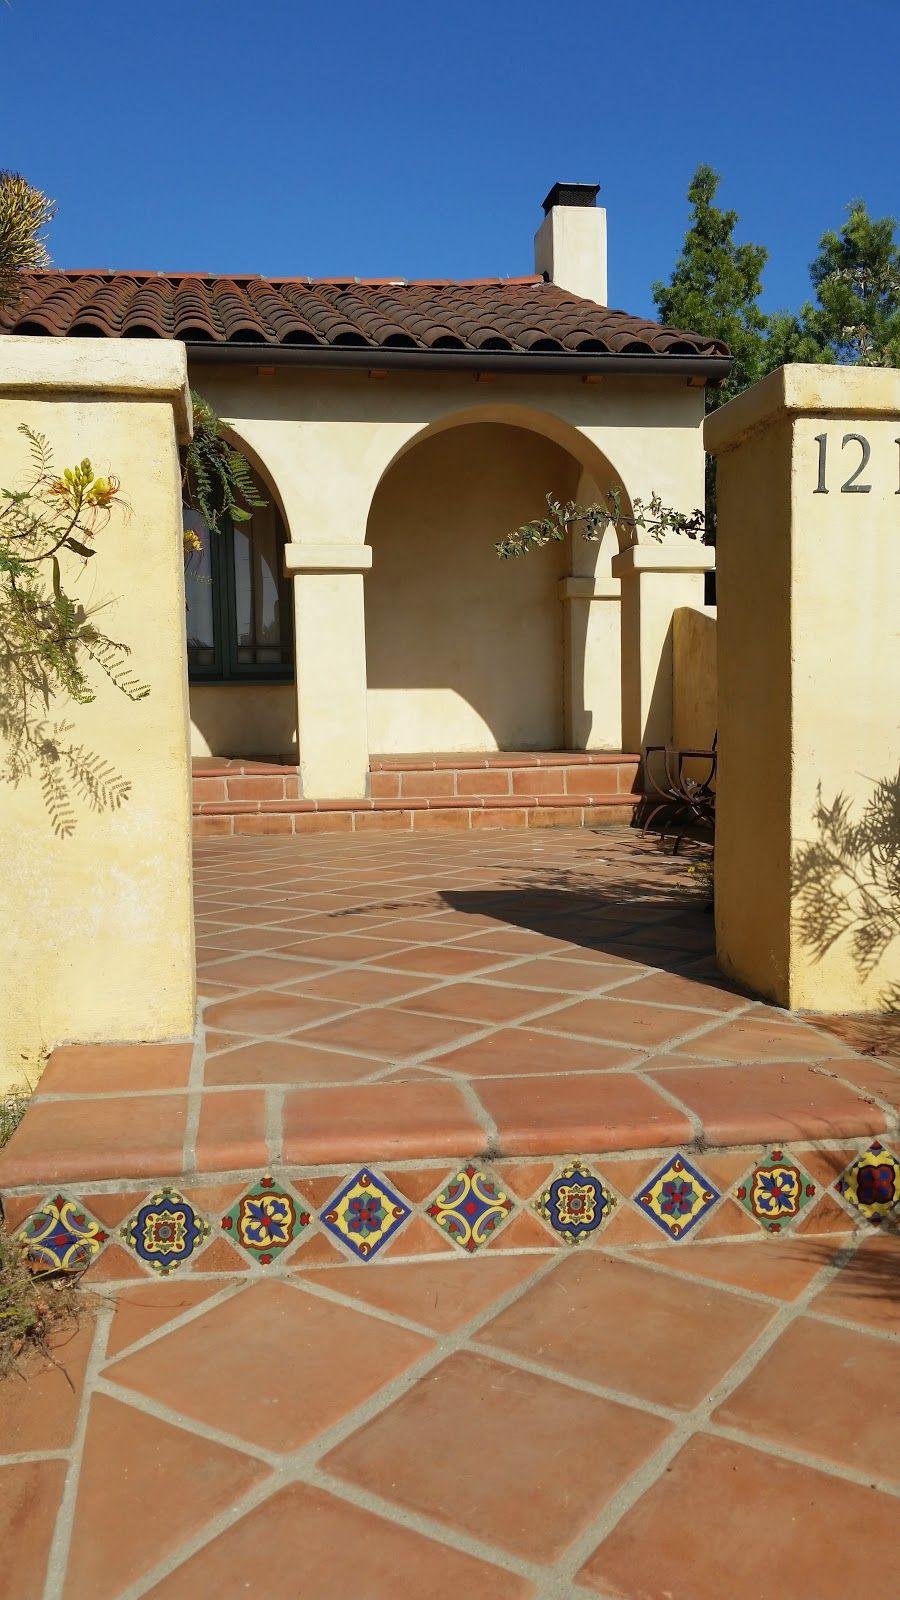 Spanish Tile Details Charm This Los Angeles Neighborhood Spanish